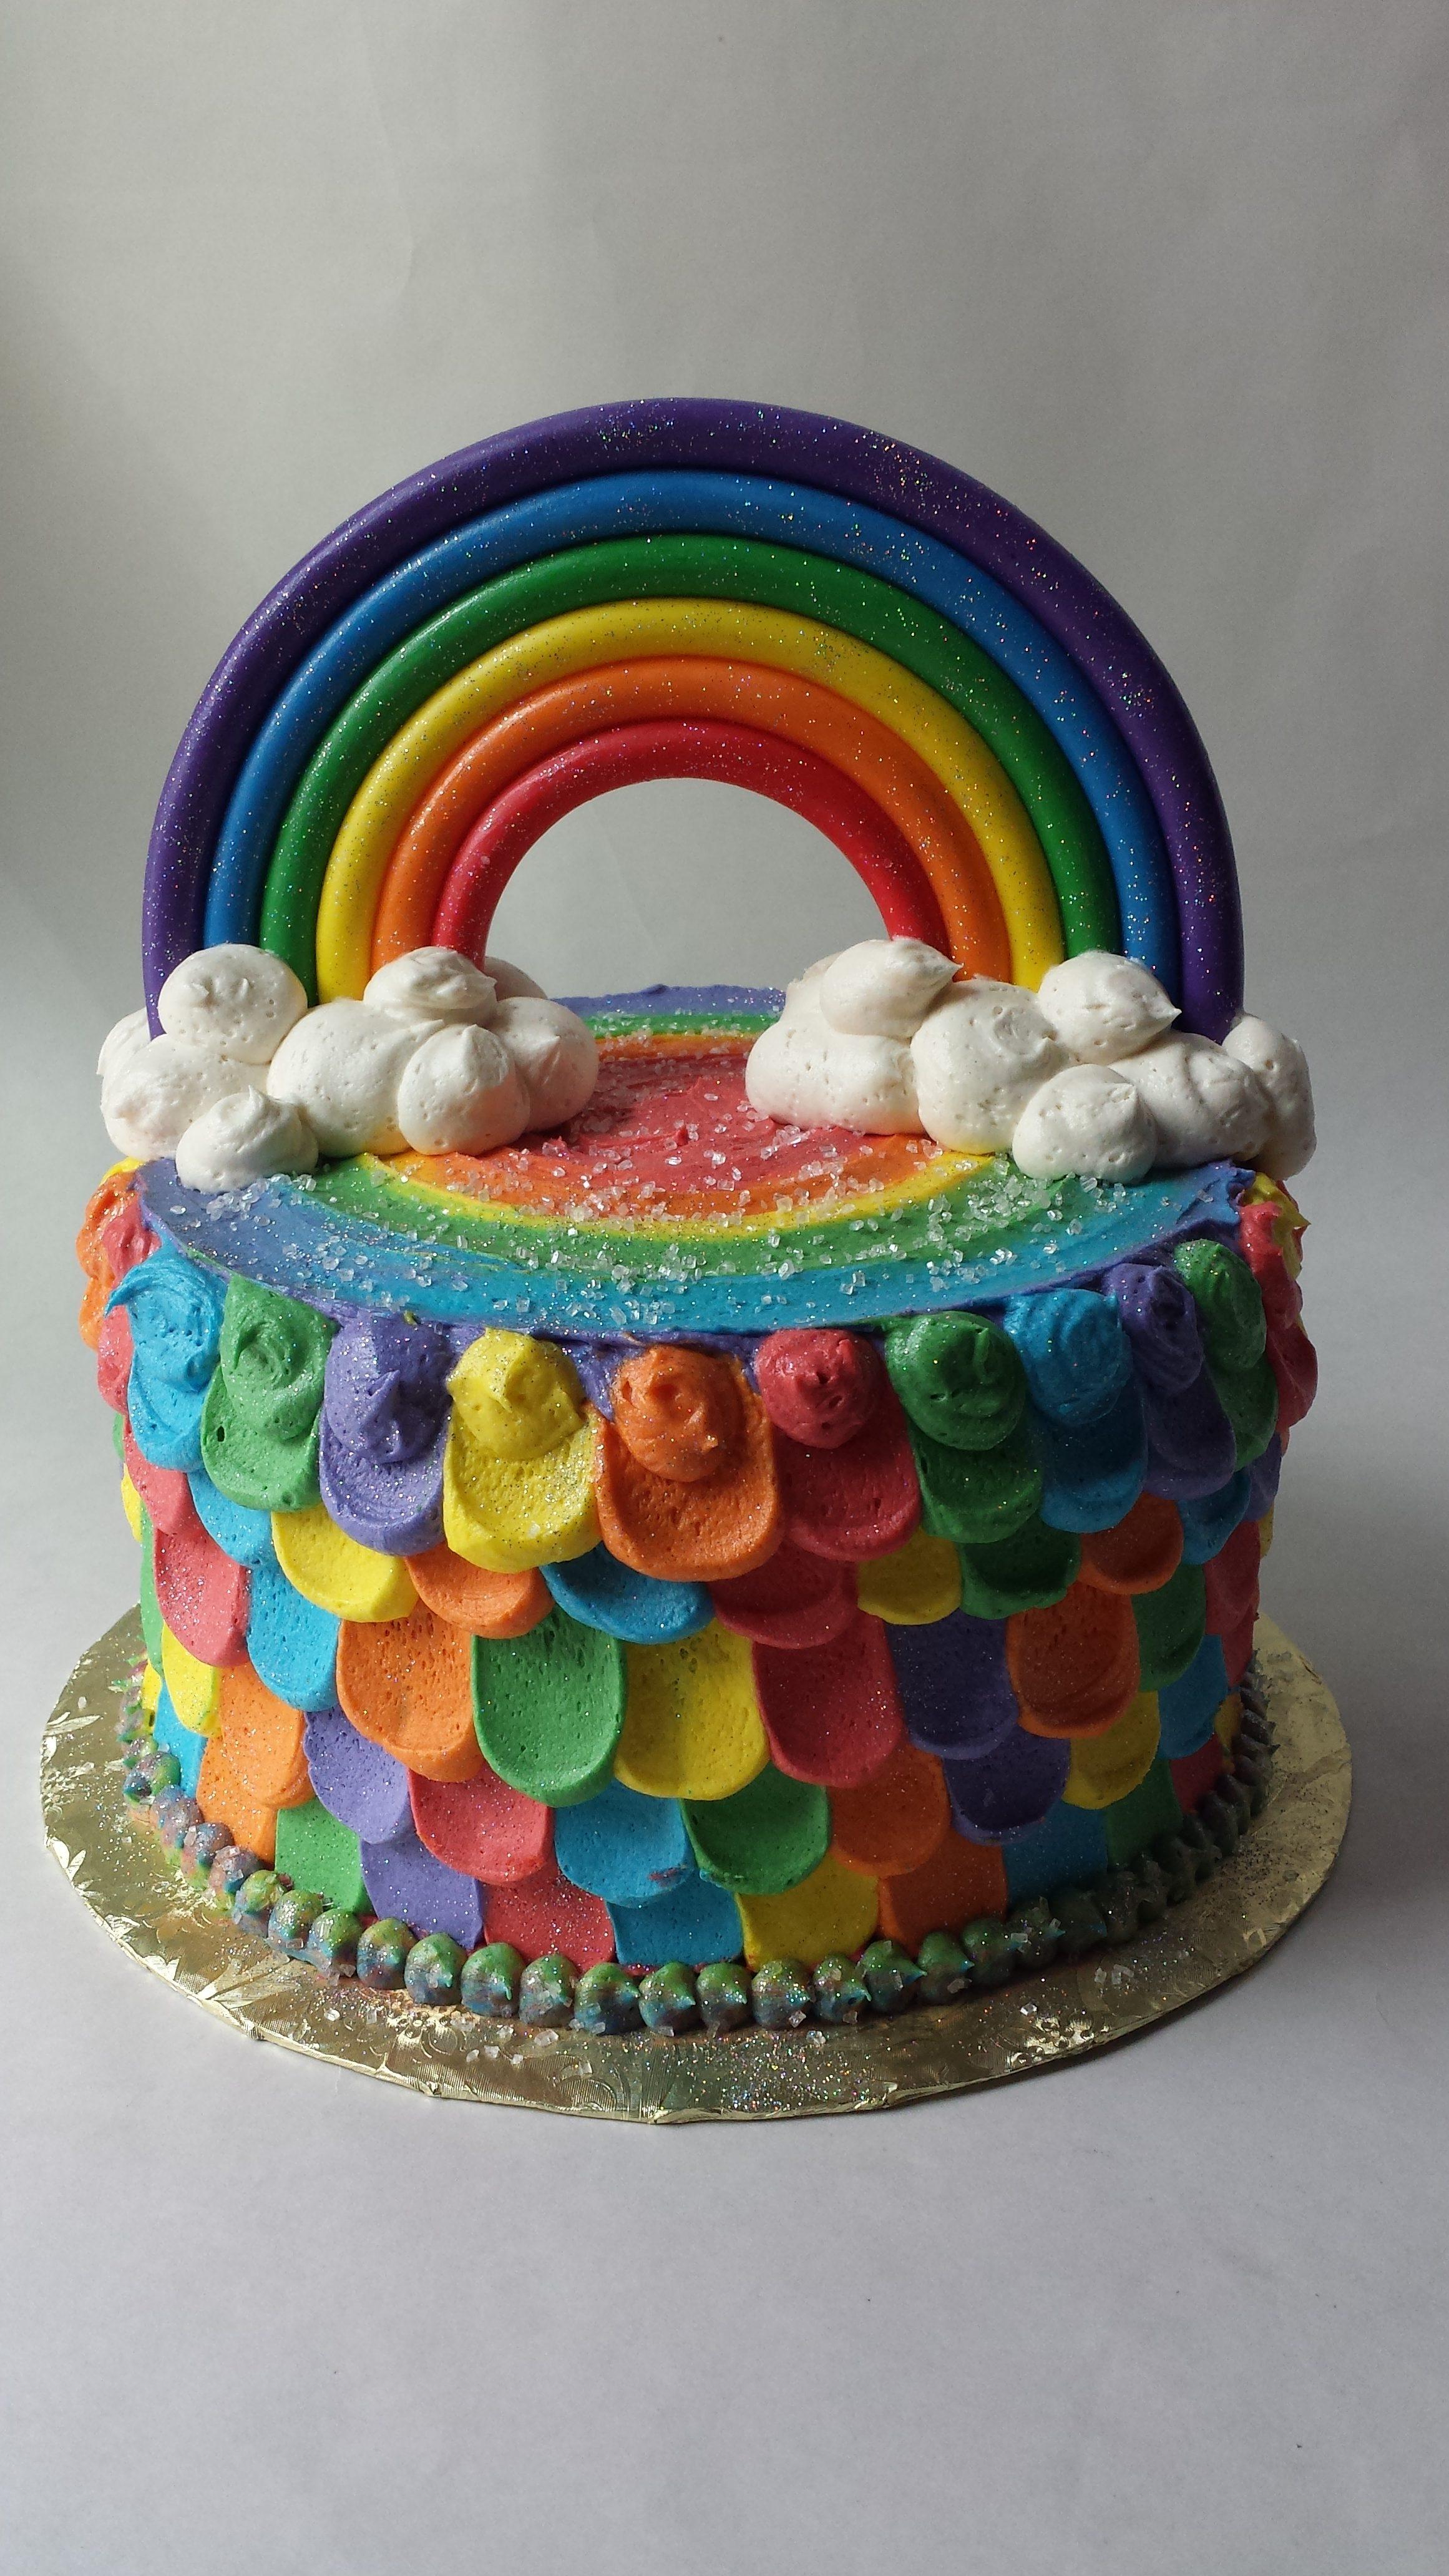 Multi color rainbow birthday cake